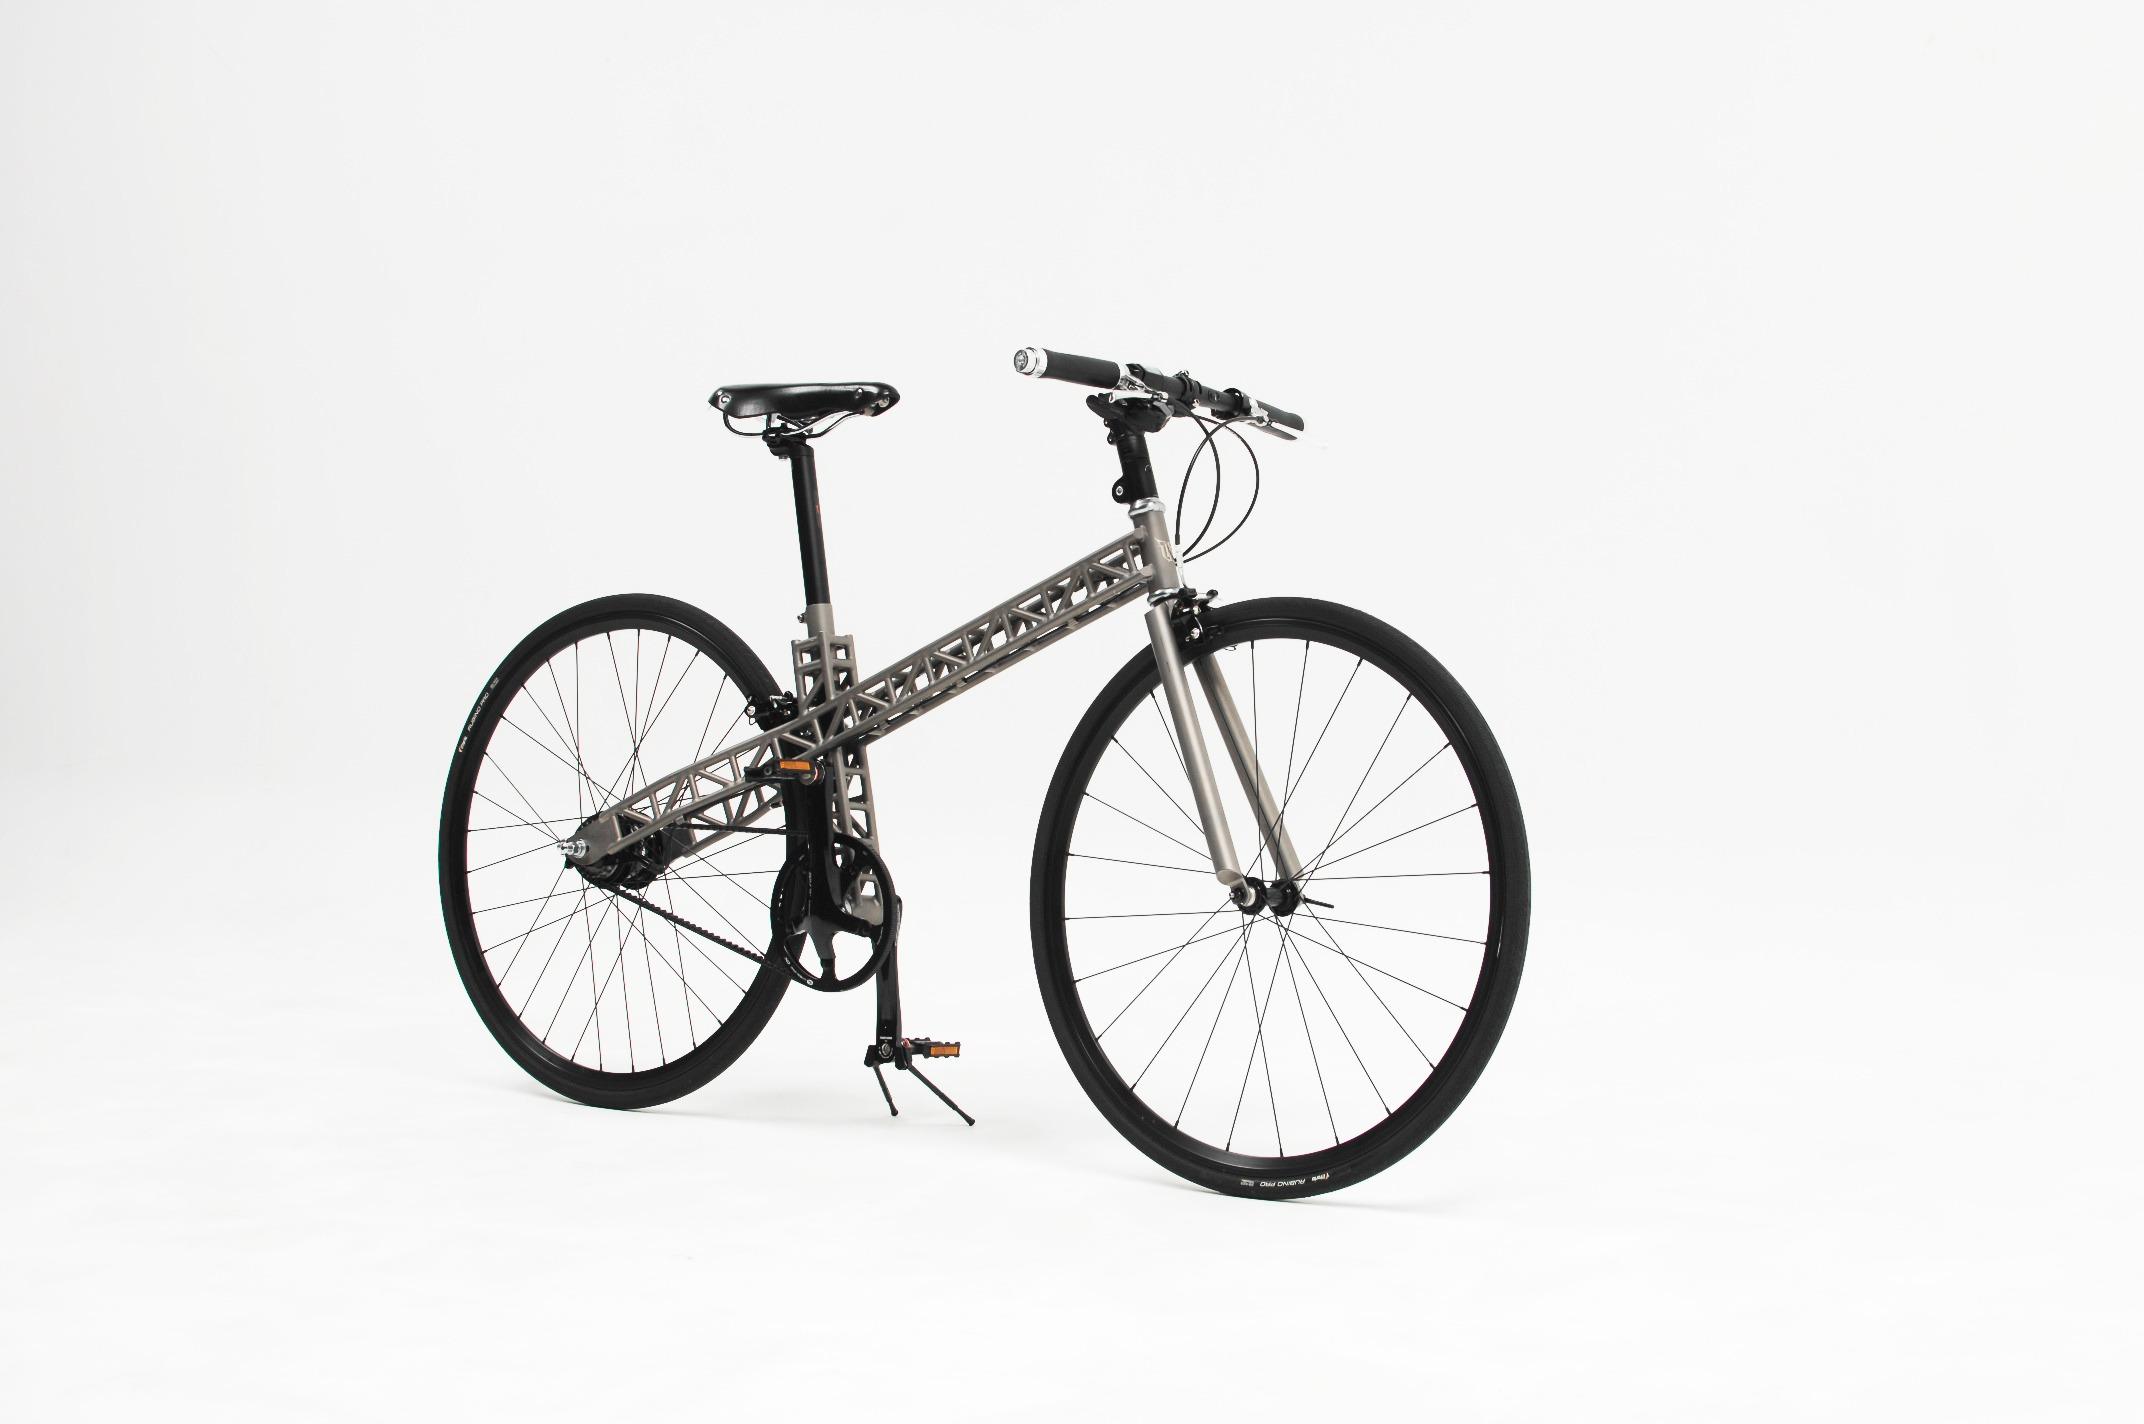 The urban bike T bike titanium